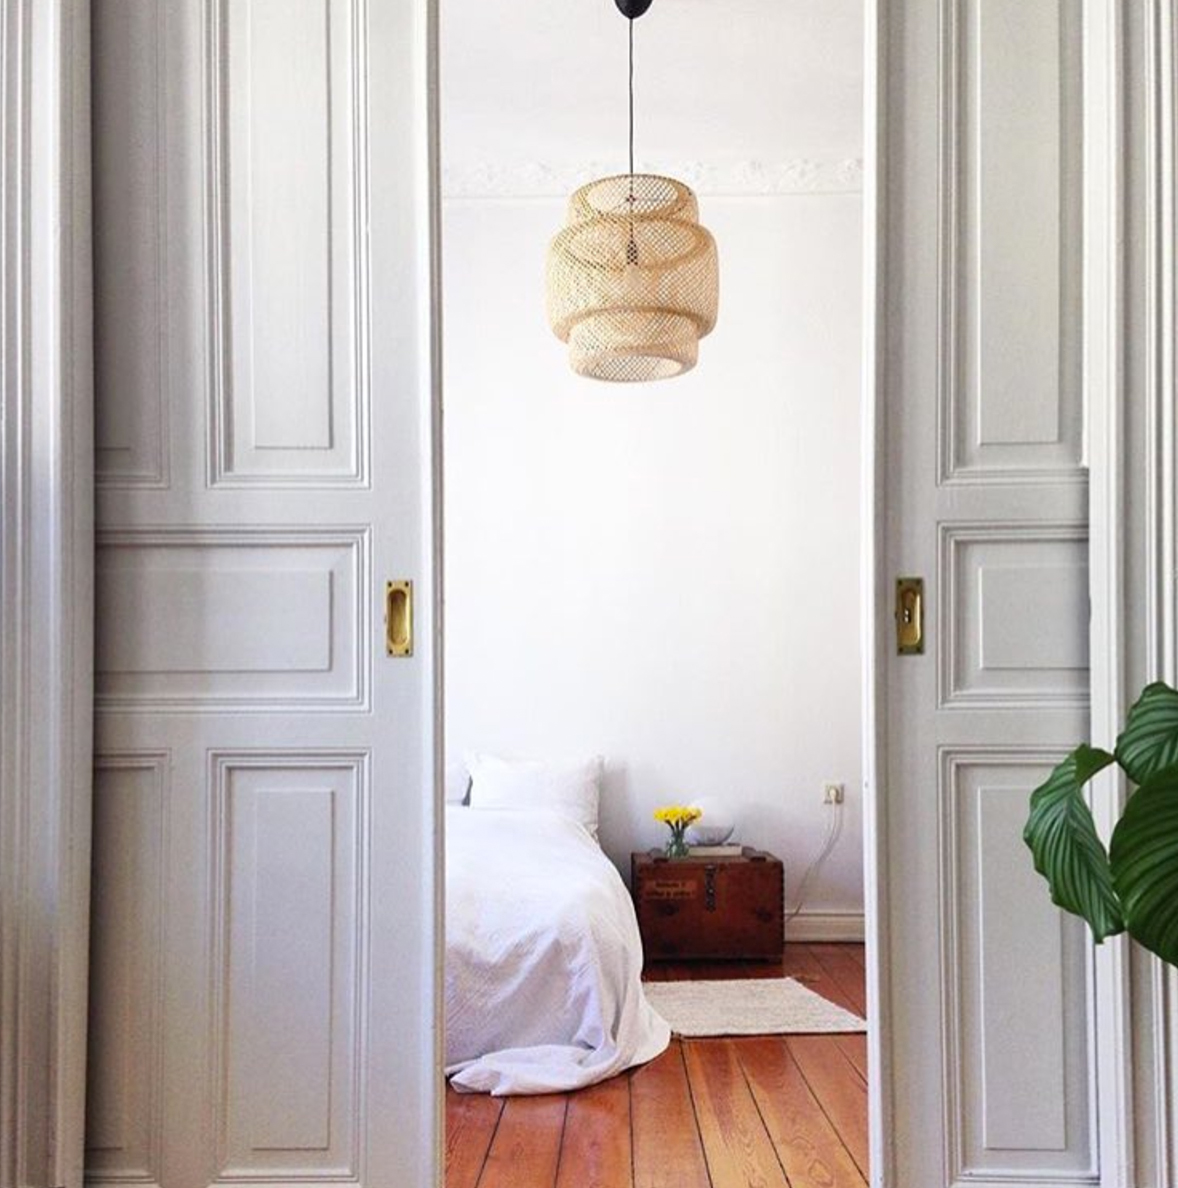 schlafzimmer-ideen-altbau - Wohnkonfetti